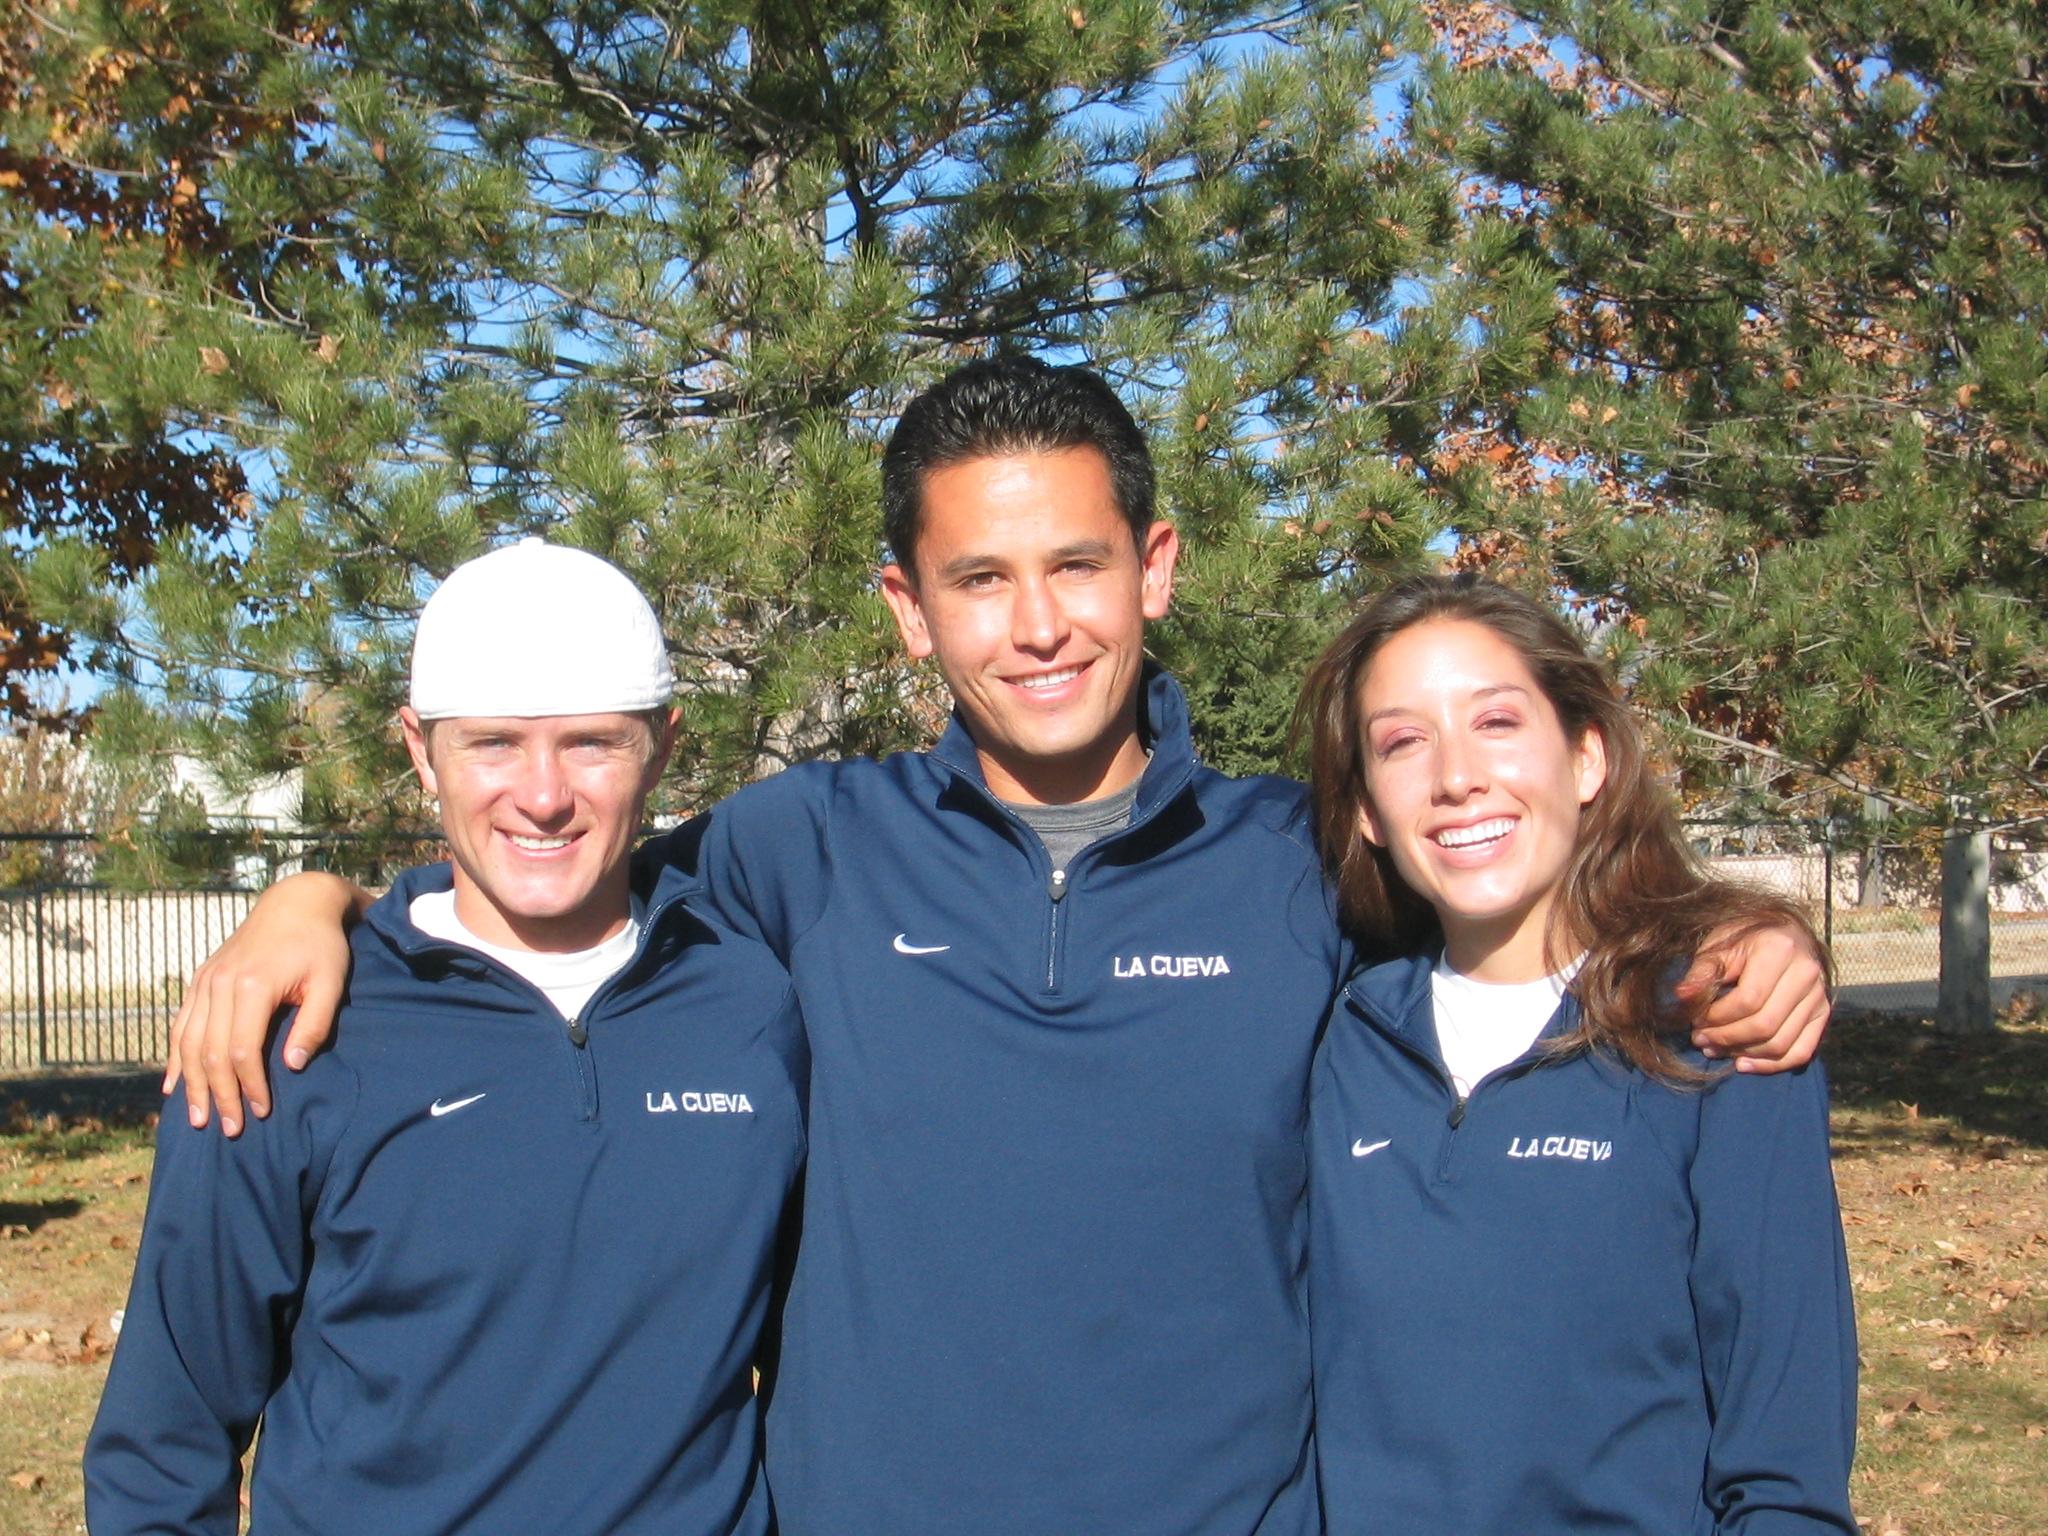 Chris Rogers, Nick Martinez, Jackie Gallegos - 2006